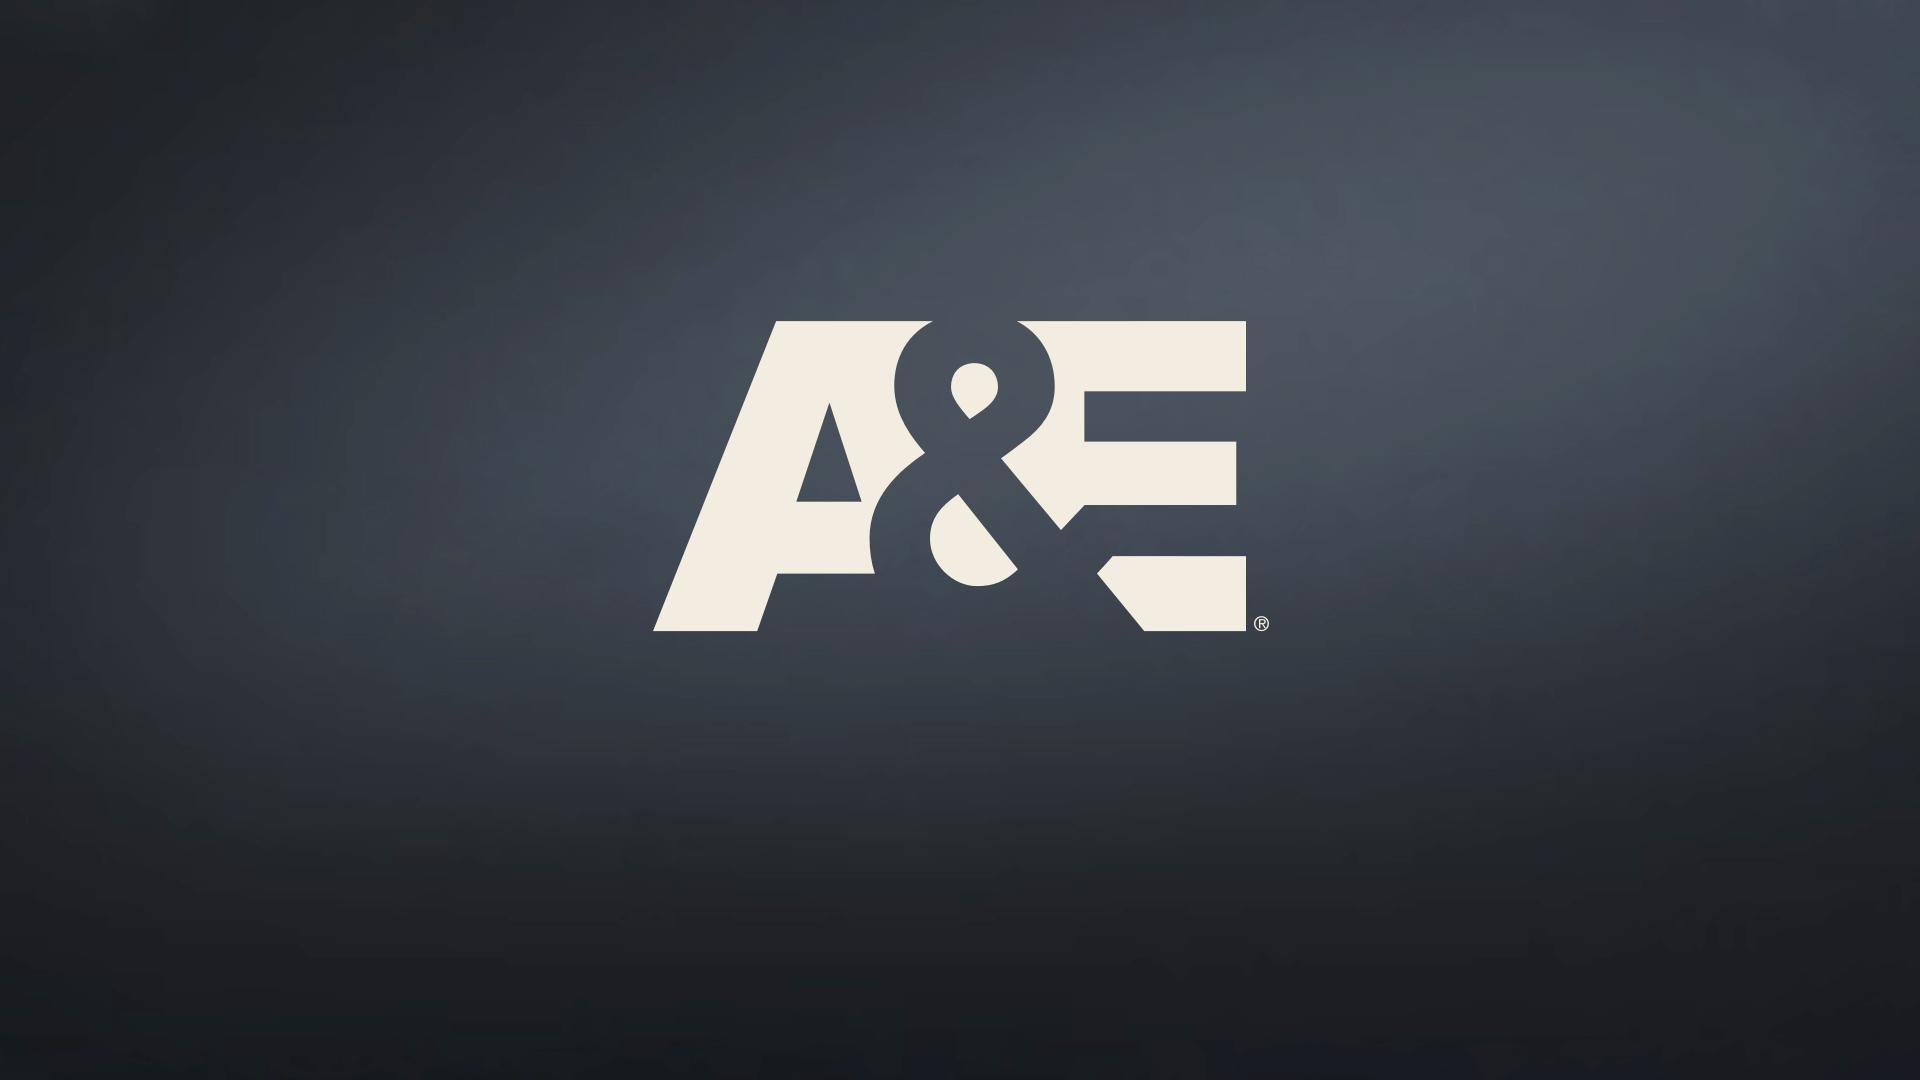 A & E   TV News 2017   Hollywood News 2017